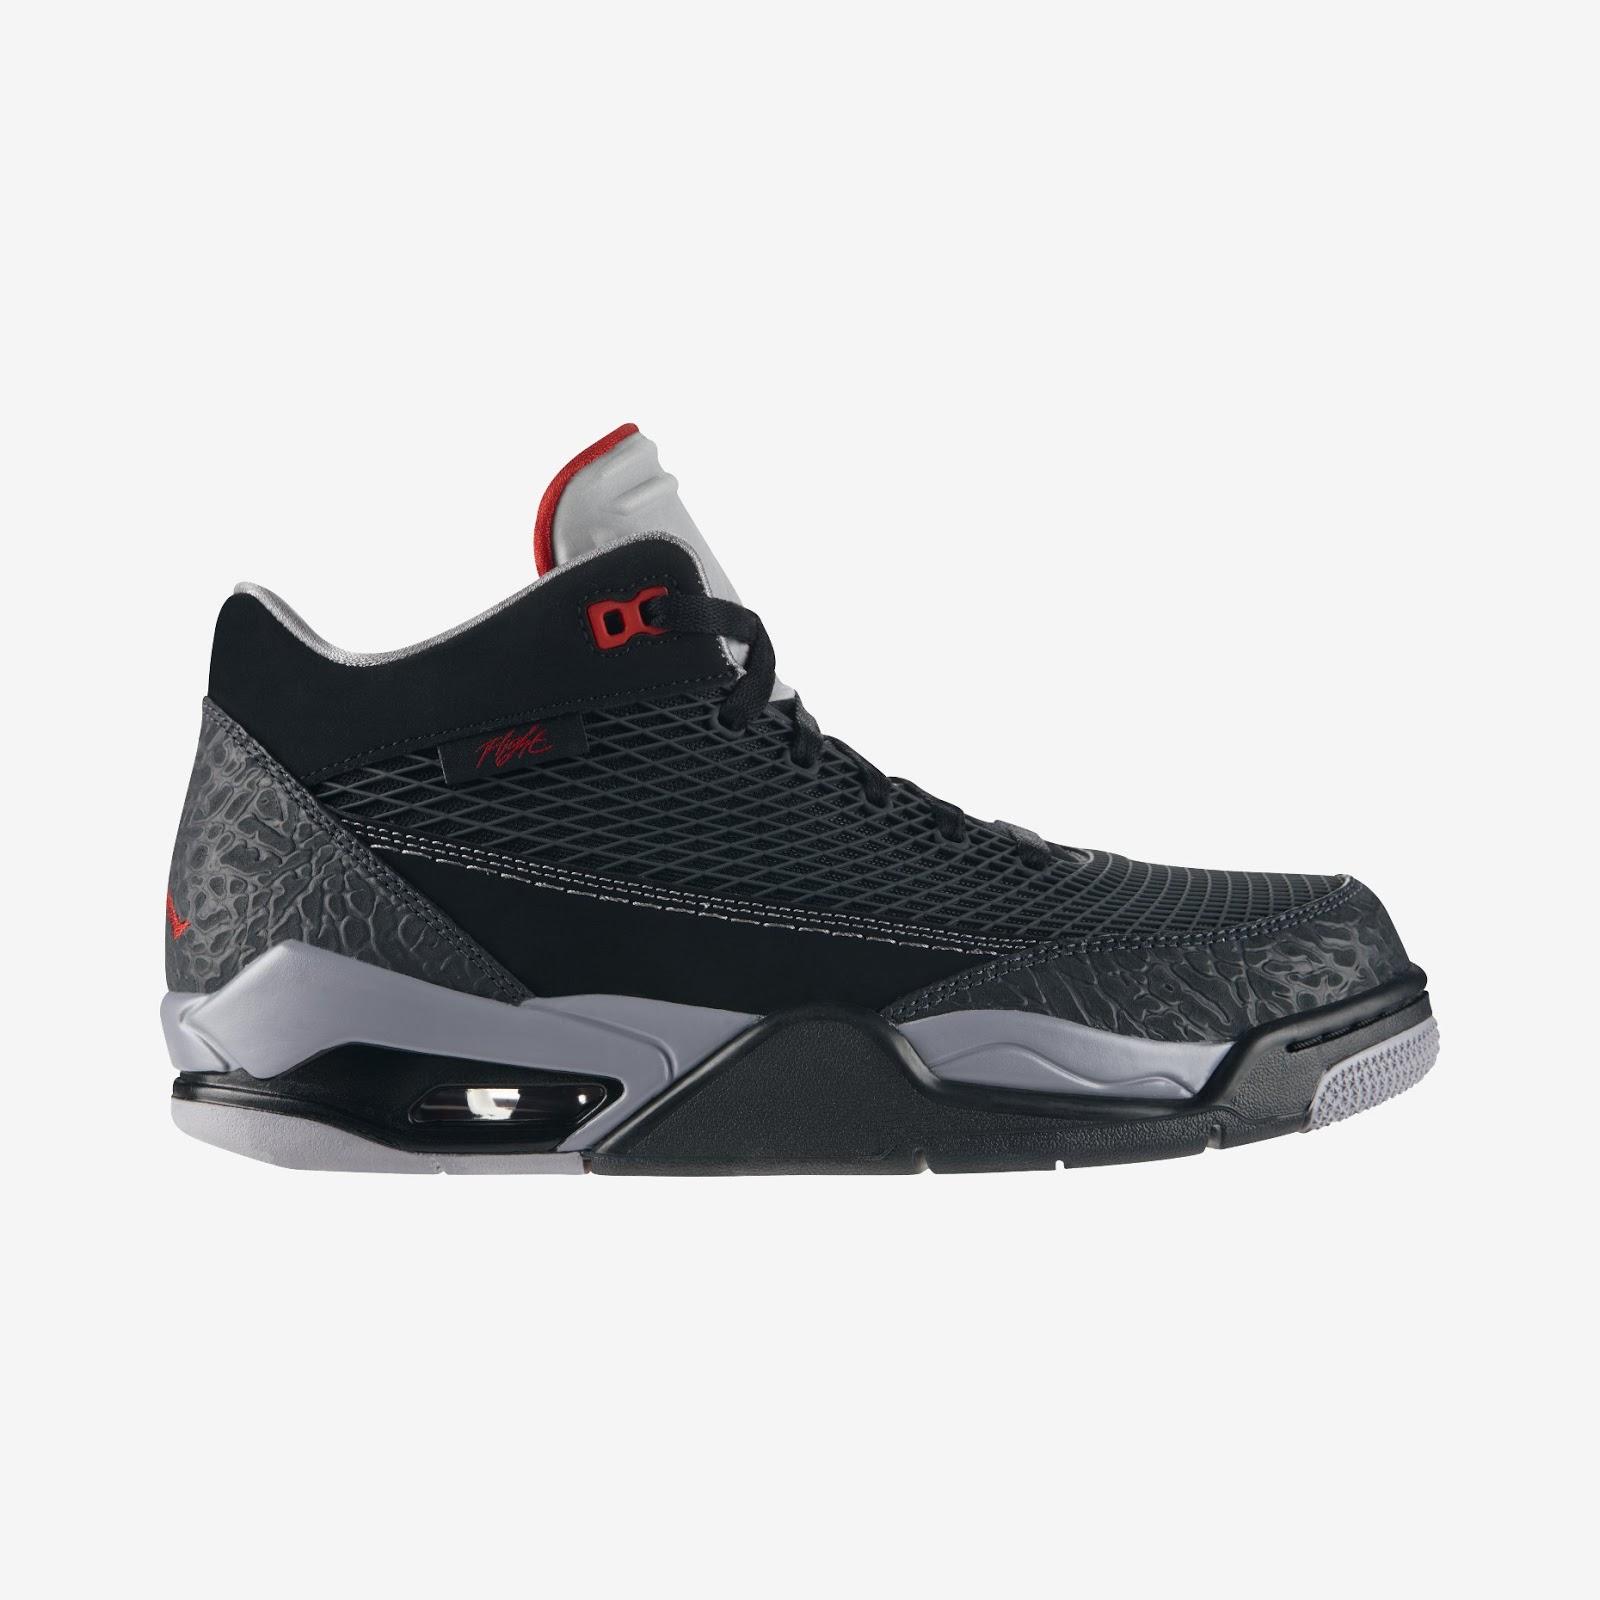 b96f5cd4524b Nike Air Jordan Retro Basketball Shoes and Sandals!  JORDAN FLIGHT ...